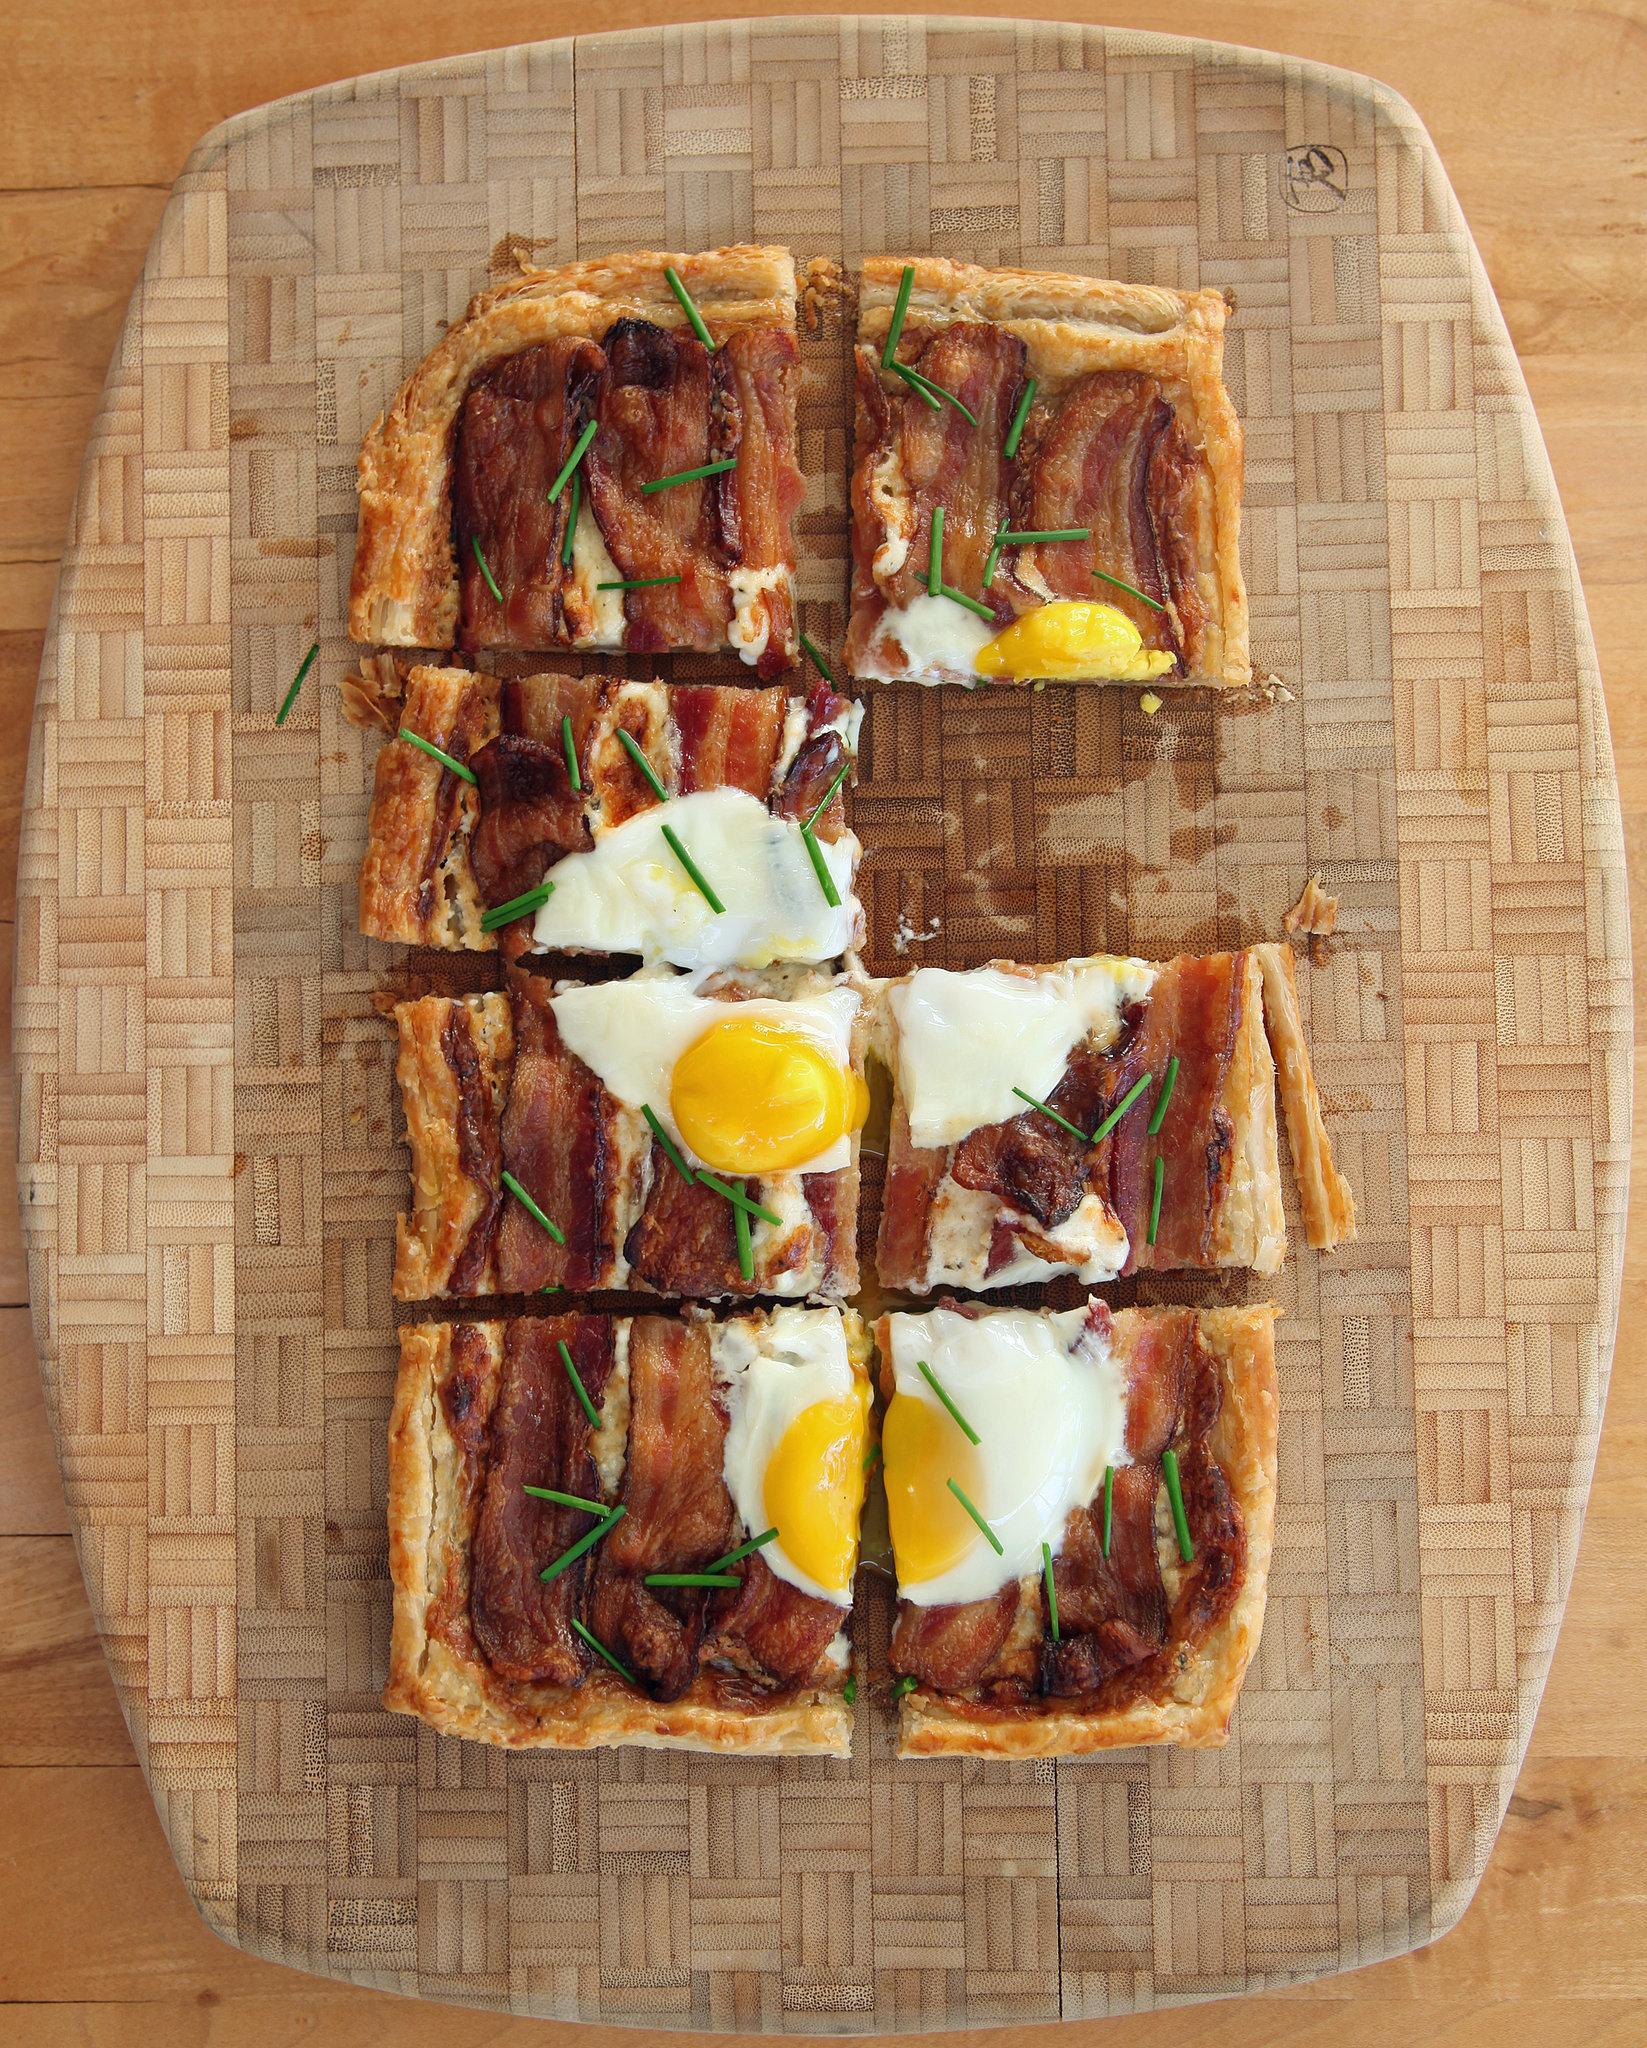 Recipe for bacon and egg breakfast tart popsugar food forumfinder Choice Image